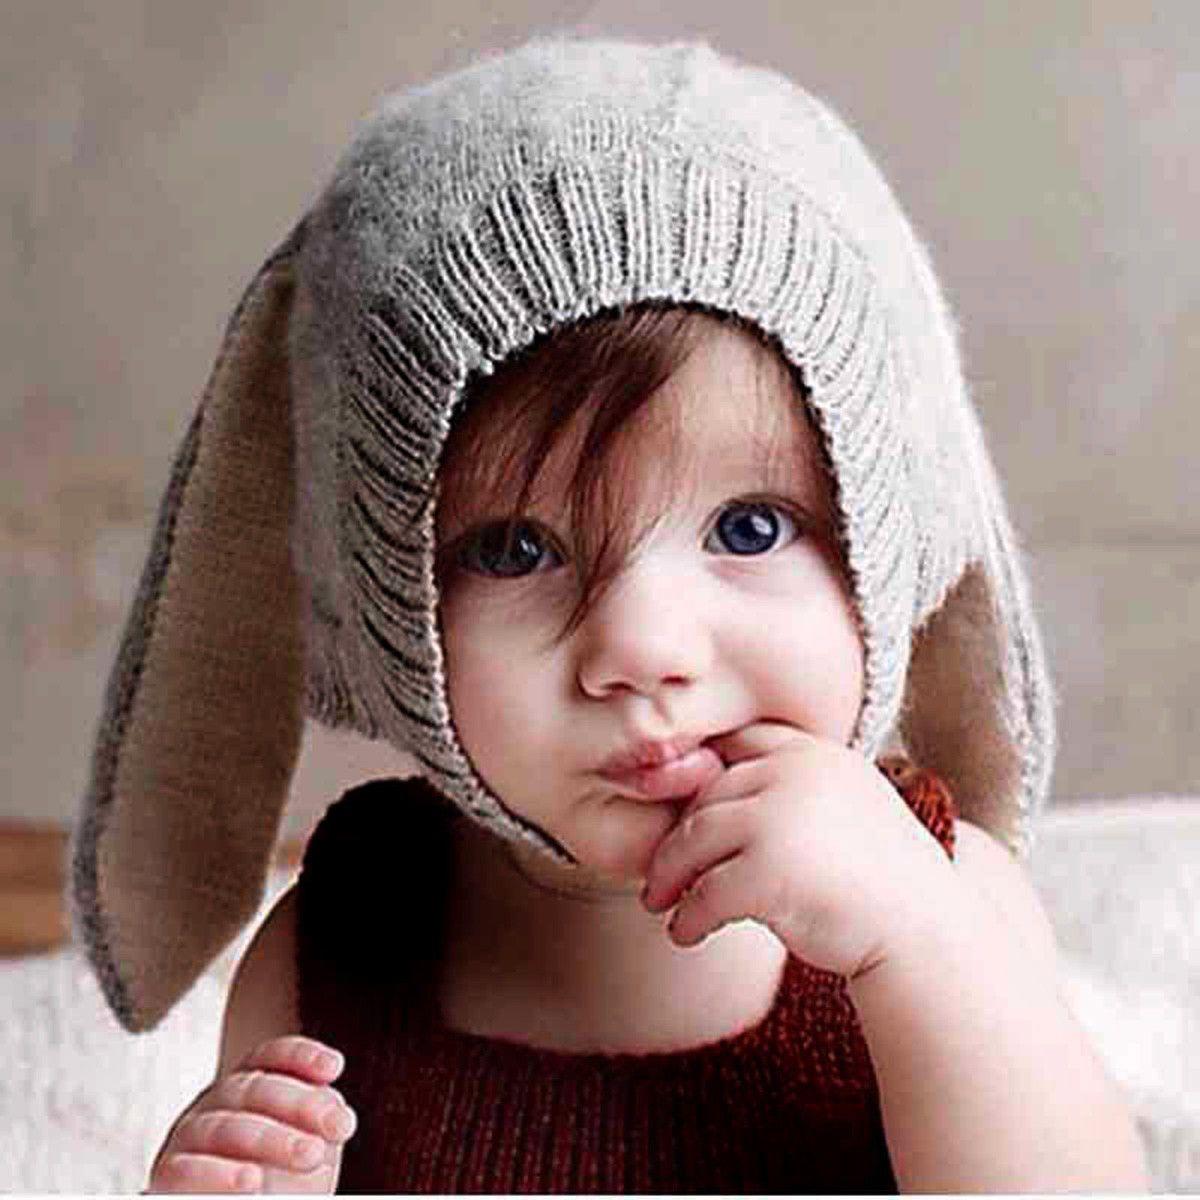 a12549efc42  2.59 - Infant Cute Rabbit Bunny Ear Hat Soft Crochet Baby Rabbit Hat  Bonnet Props Warm  ebay  Fashion